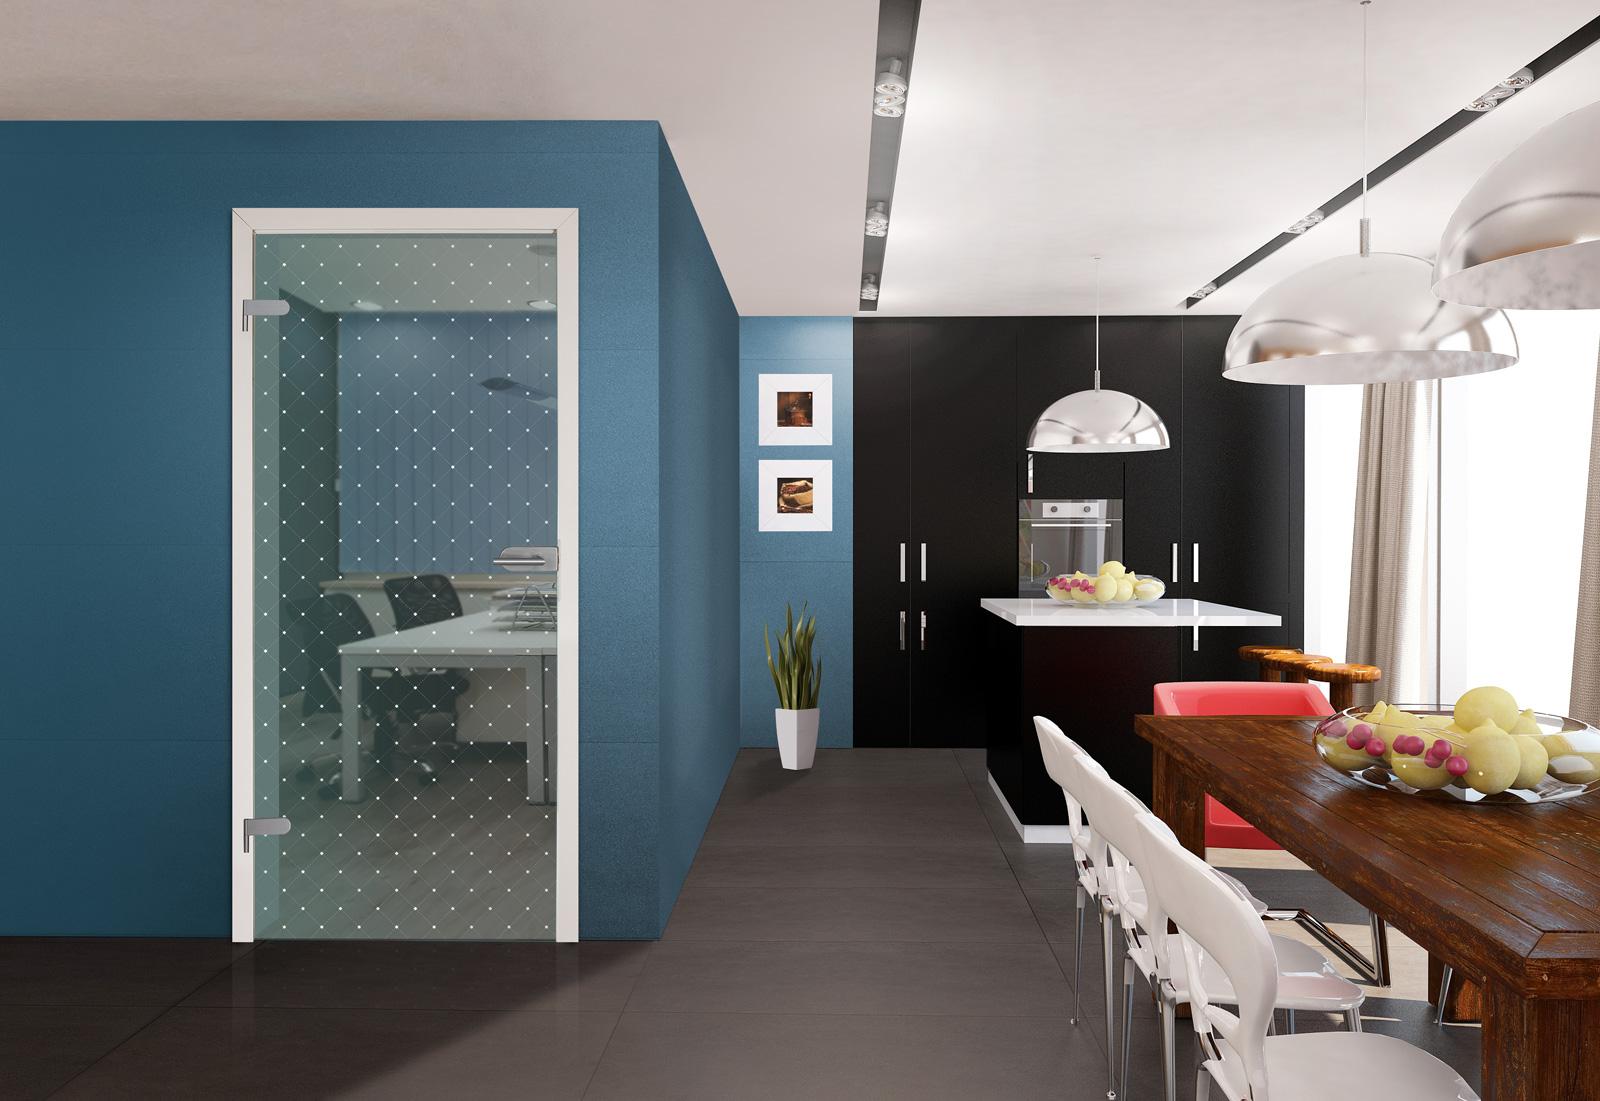 Glastur 173 1 f quotbarbadosquot kueche for Glastür küche